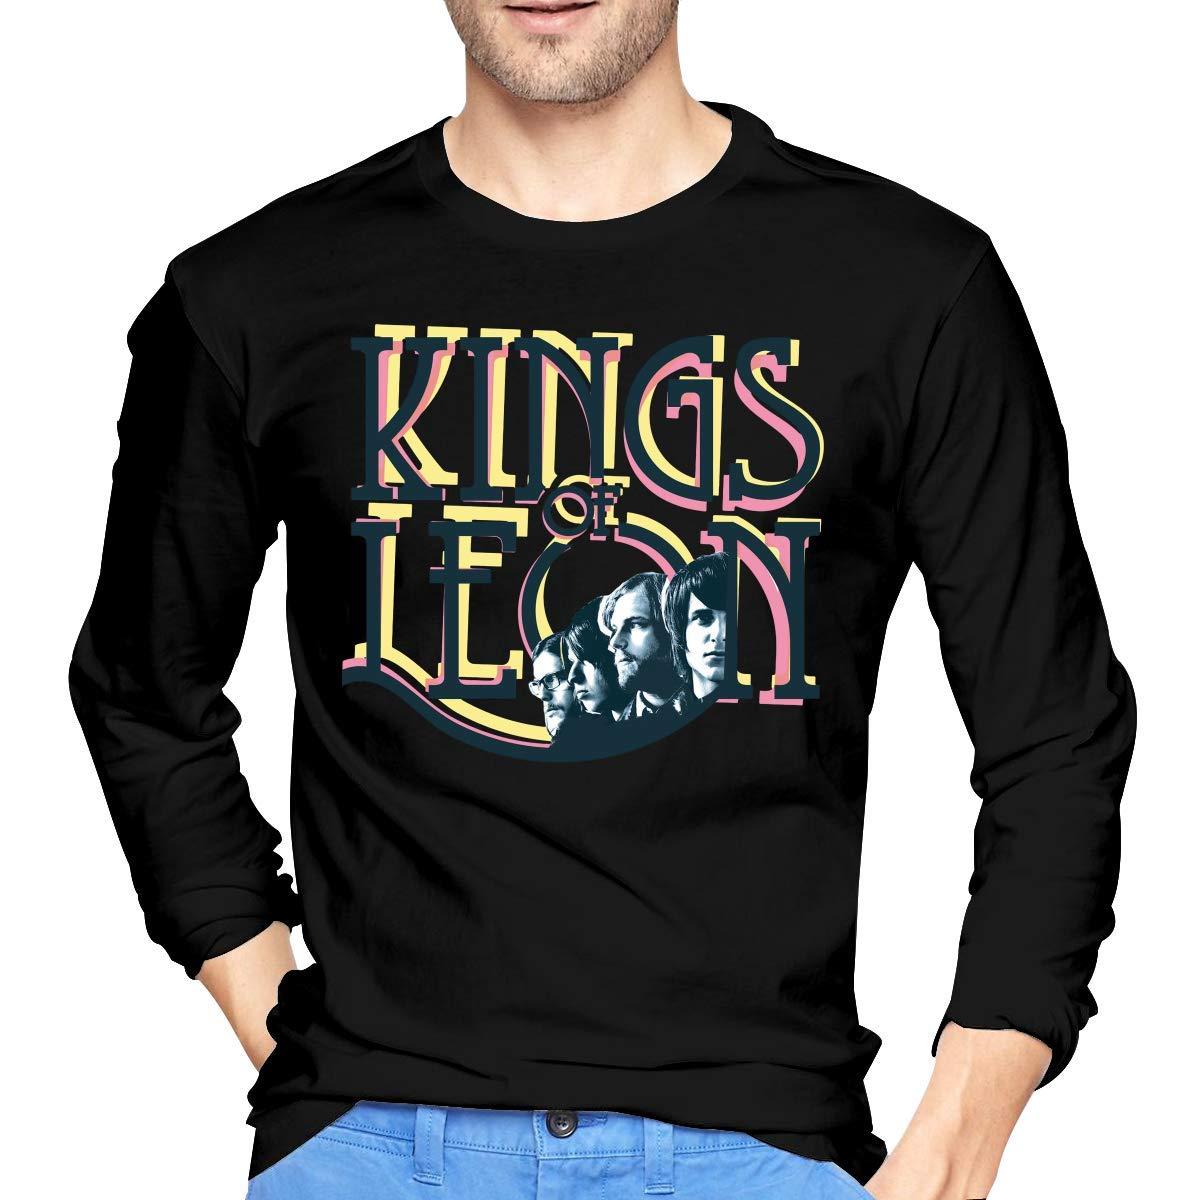 Fssatung S Kings Of Leon T Shirt Black